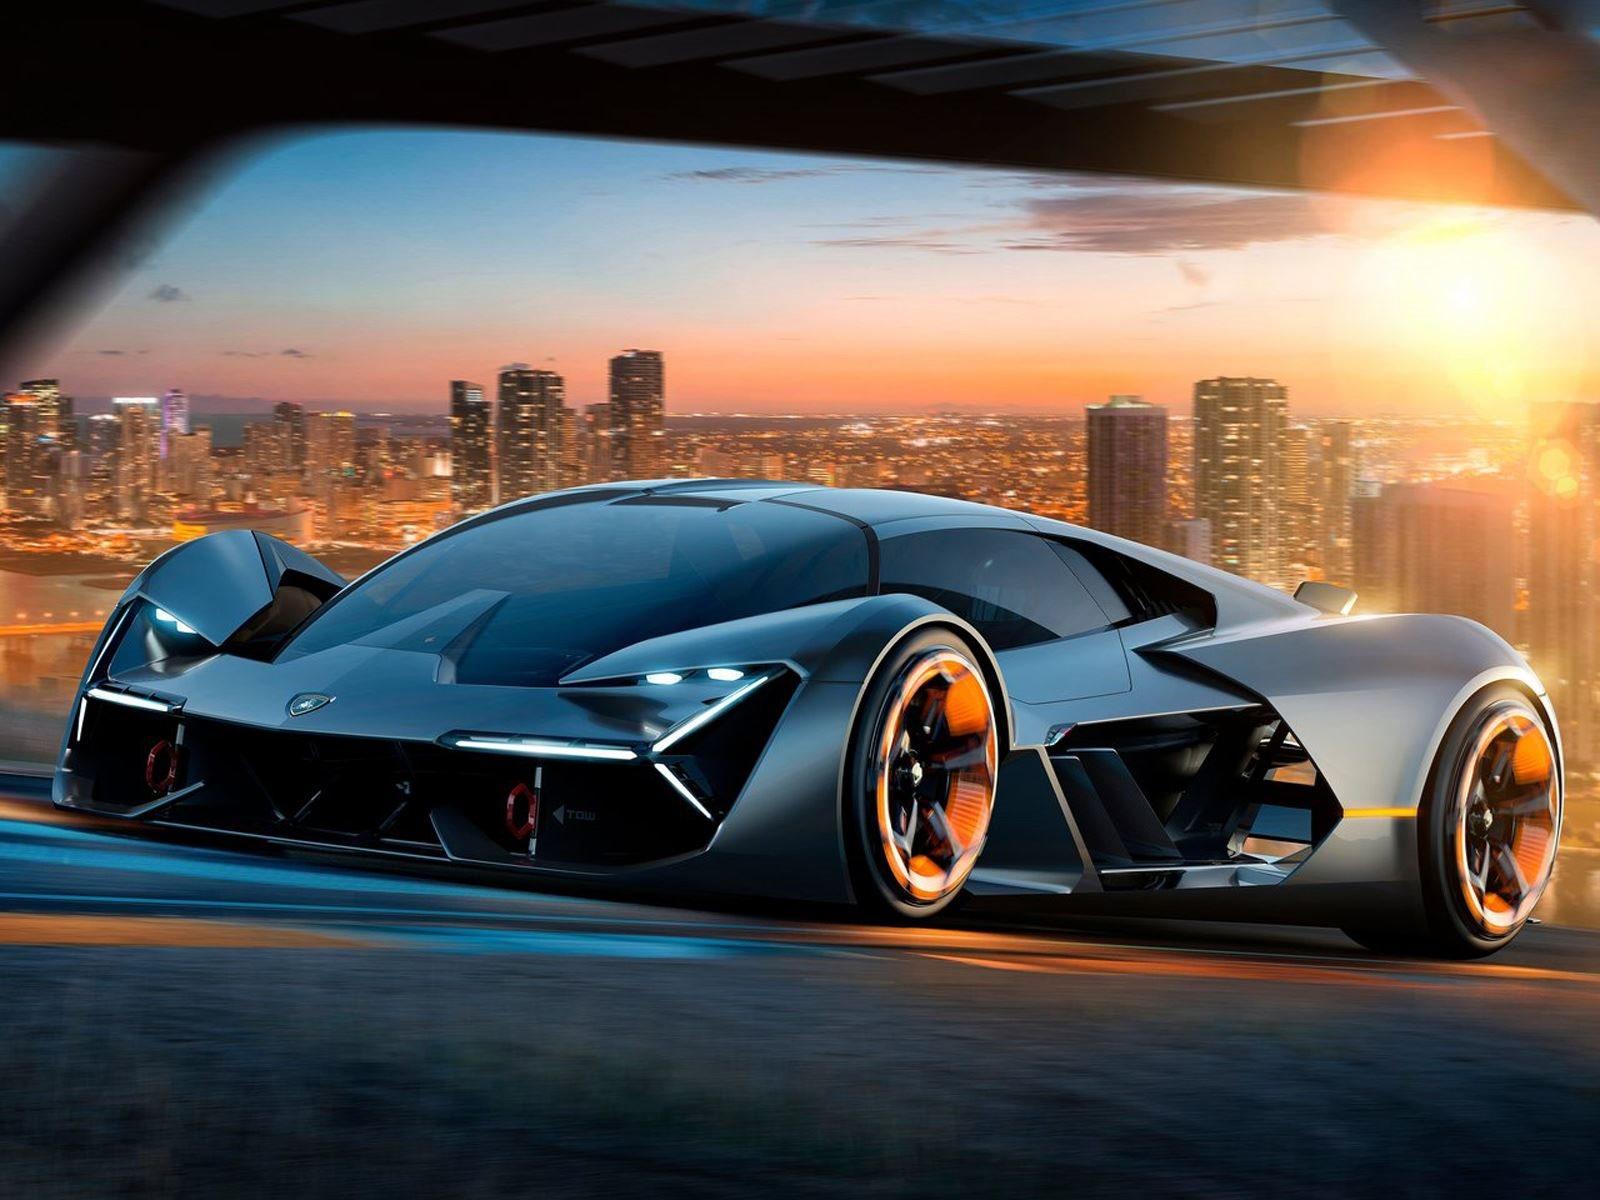 Lamborghini Aventador Successor Will Have Electric Motors Aiding Its